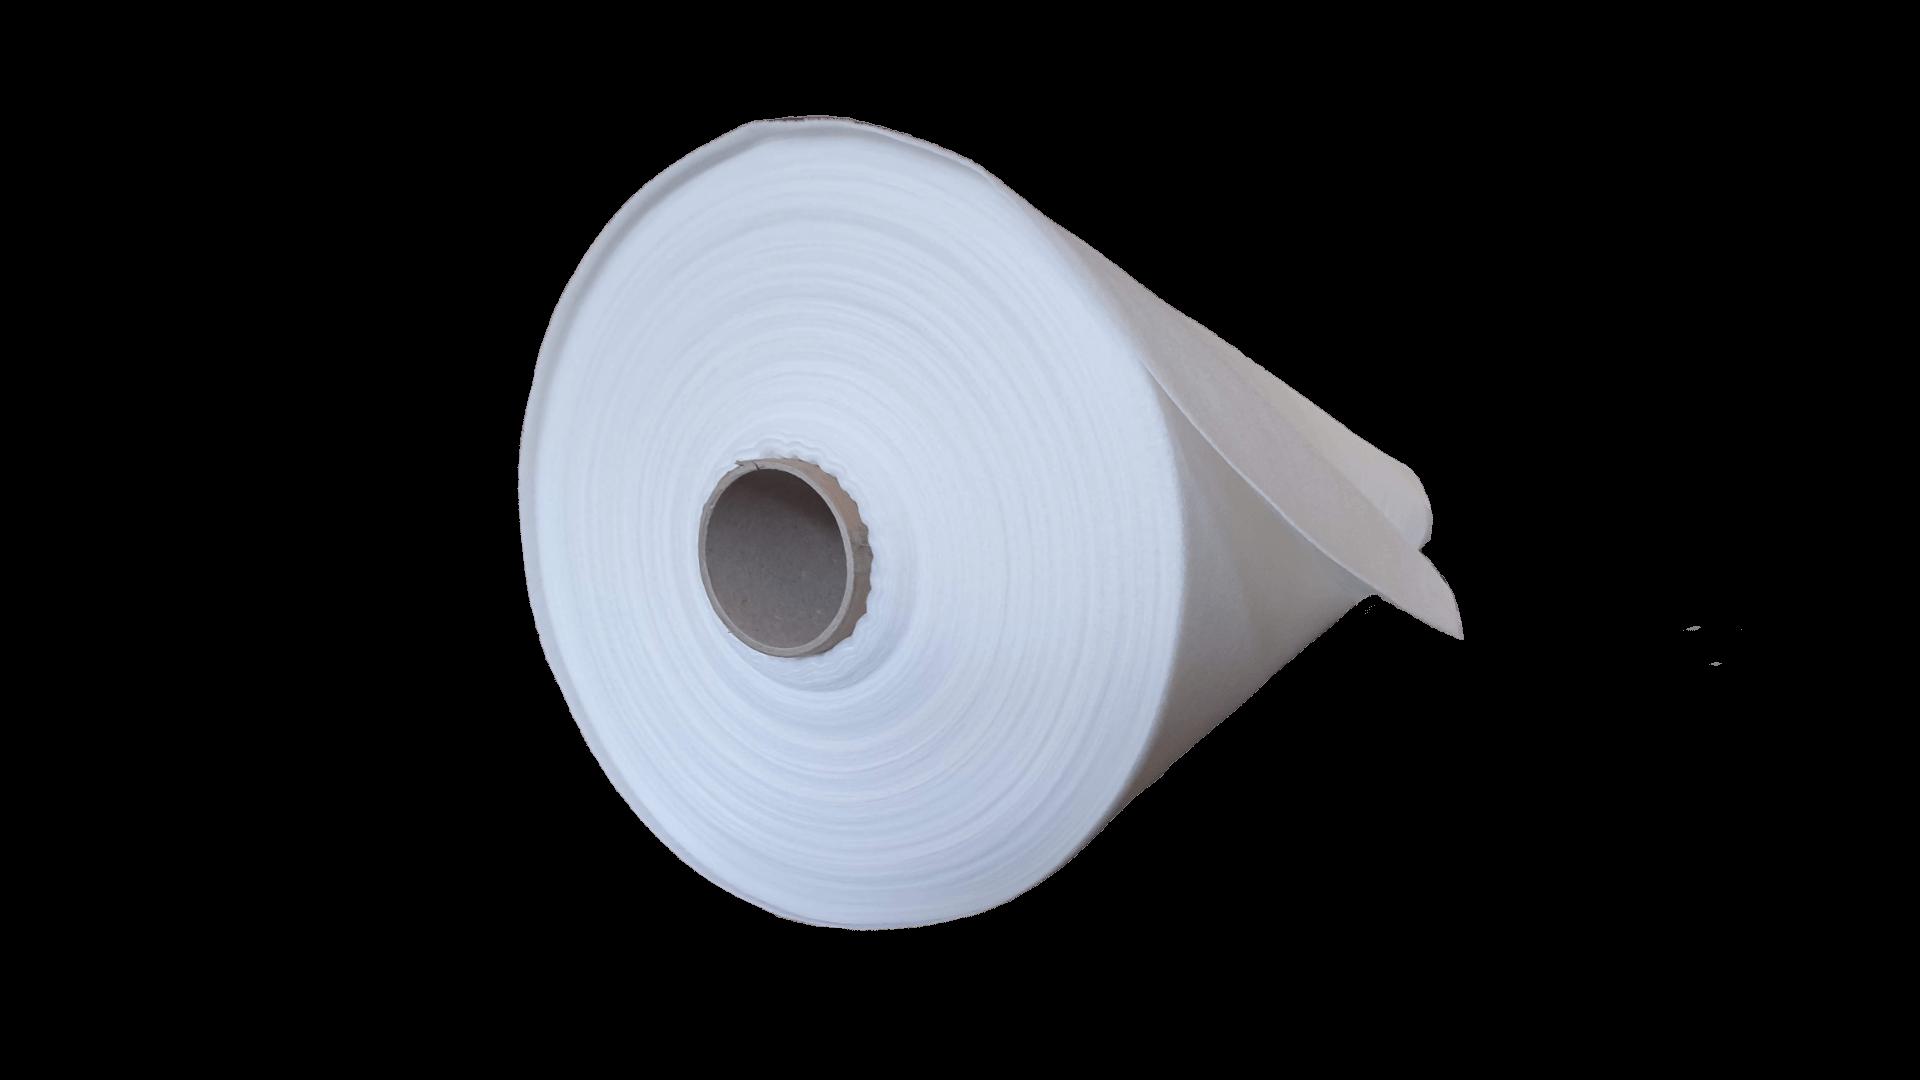 Geosin (P) 100 - material netesut polipropilena pentru articole medicale poza somnart.ro